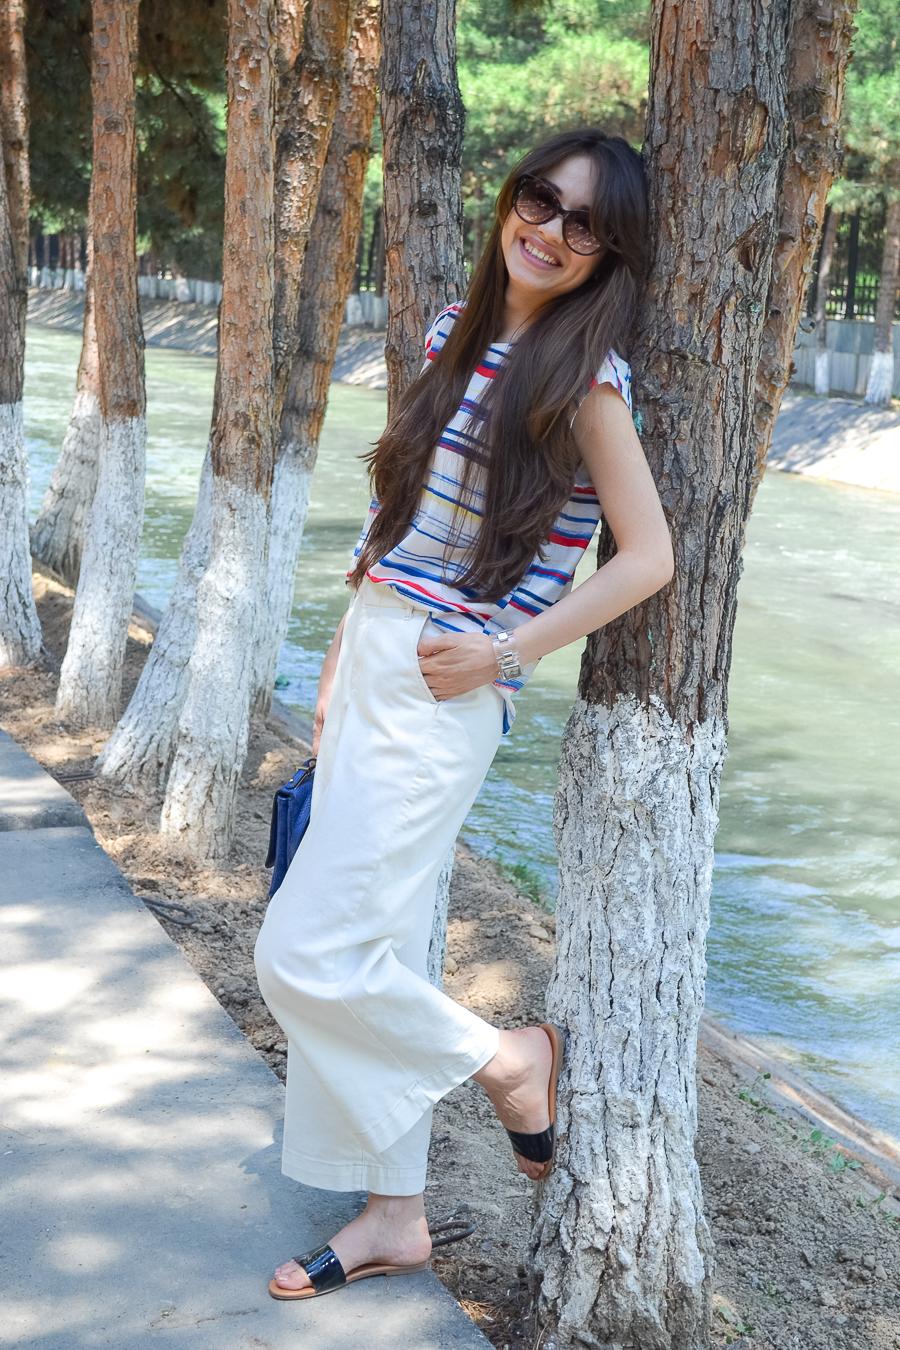 fashionblogger-diyorasnotes-style-white-culottes-zara-stripes-top-mango